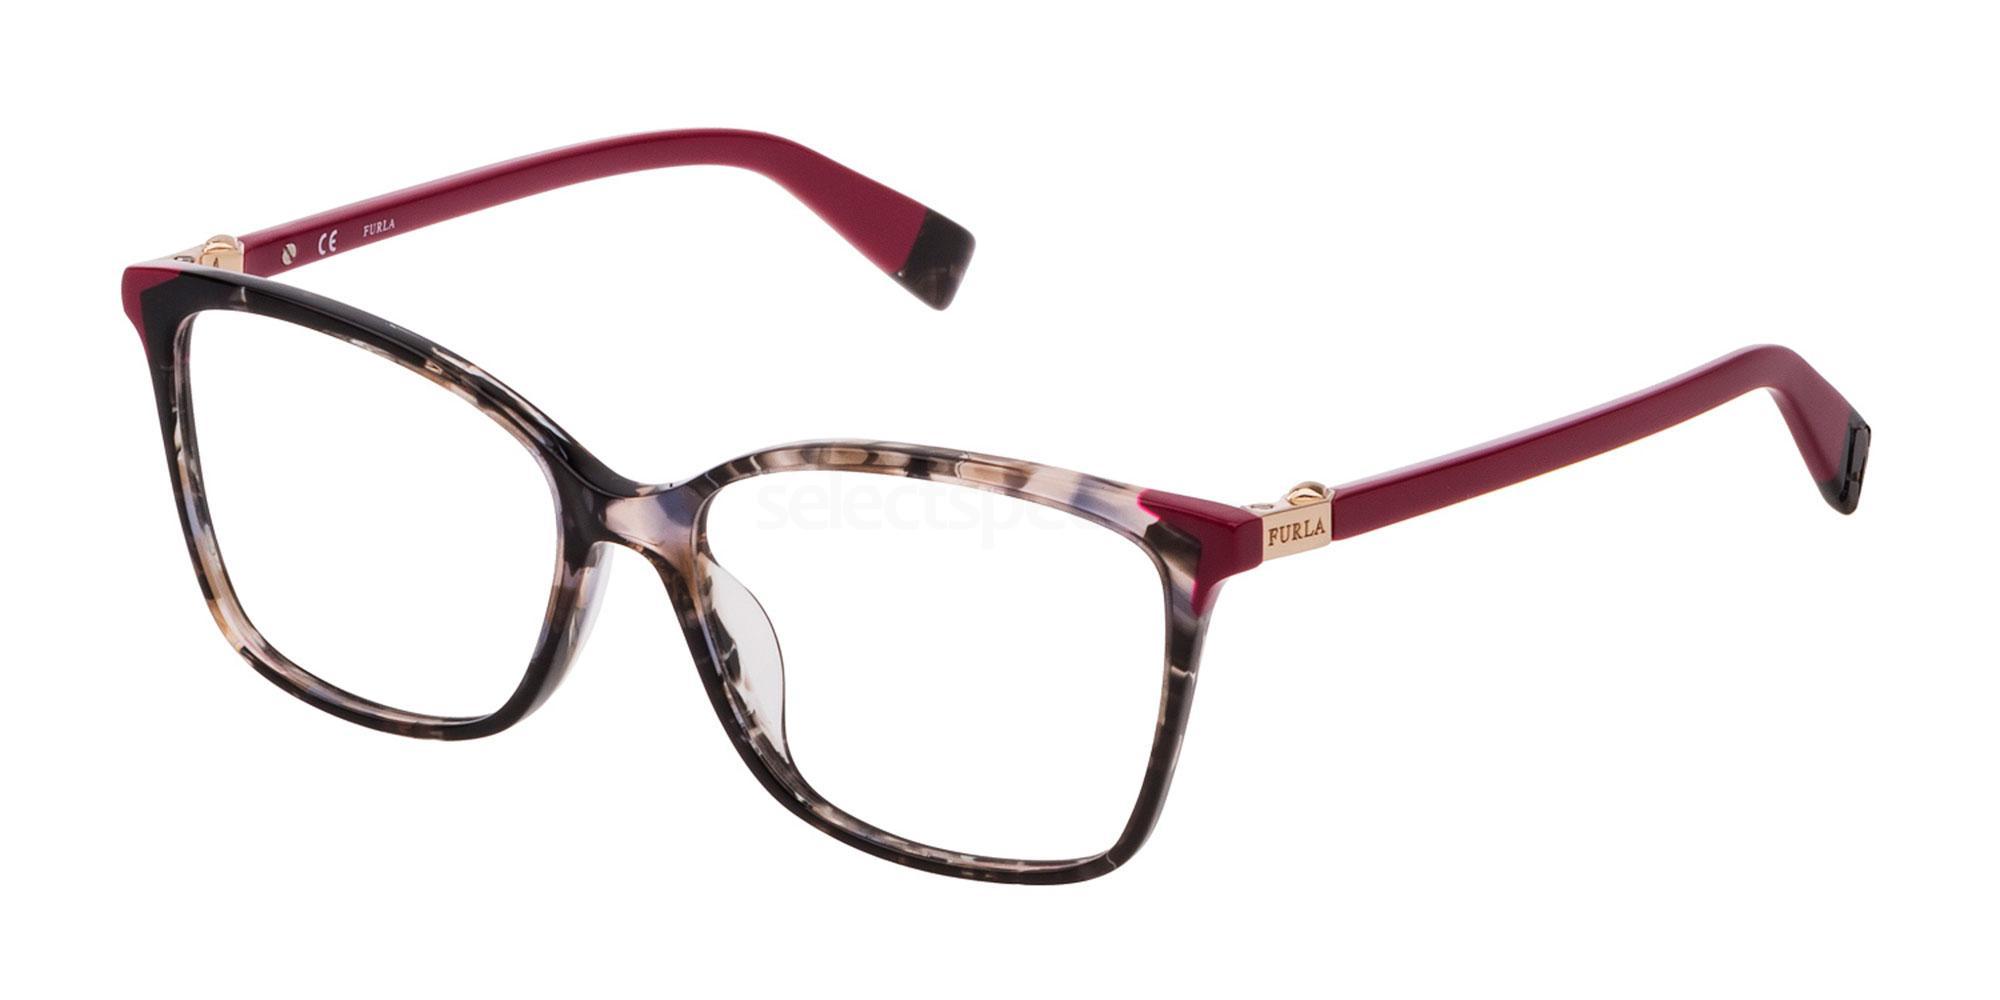 08B4 VFU295 Glasses, Furla